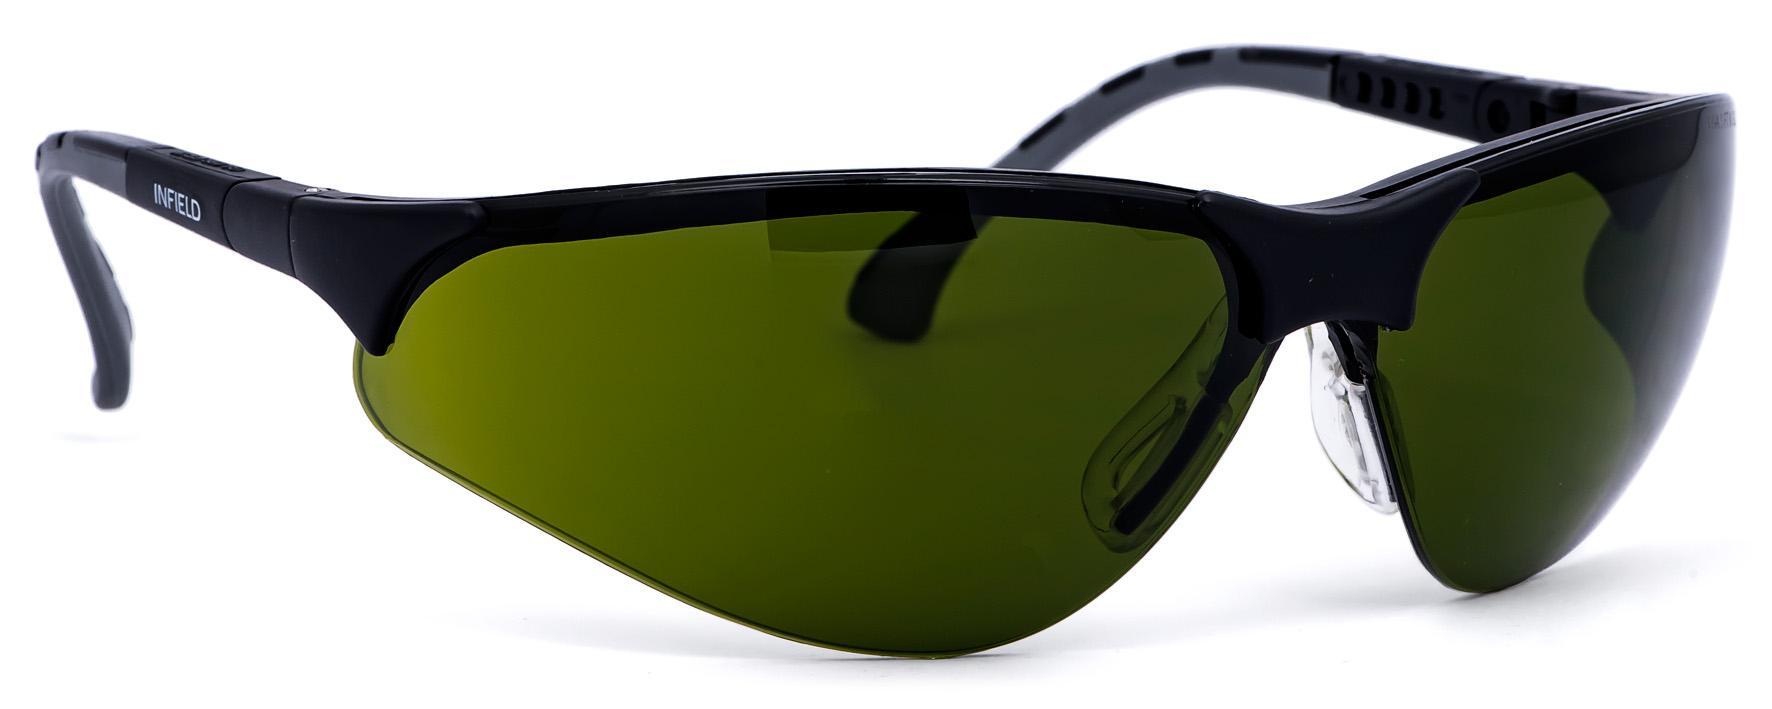 Infield Safety Occhiale per Saldatura Terminator